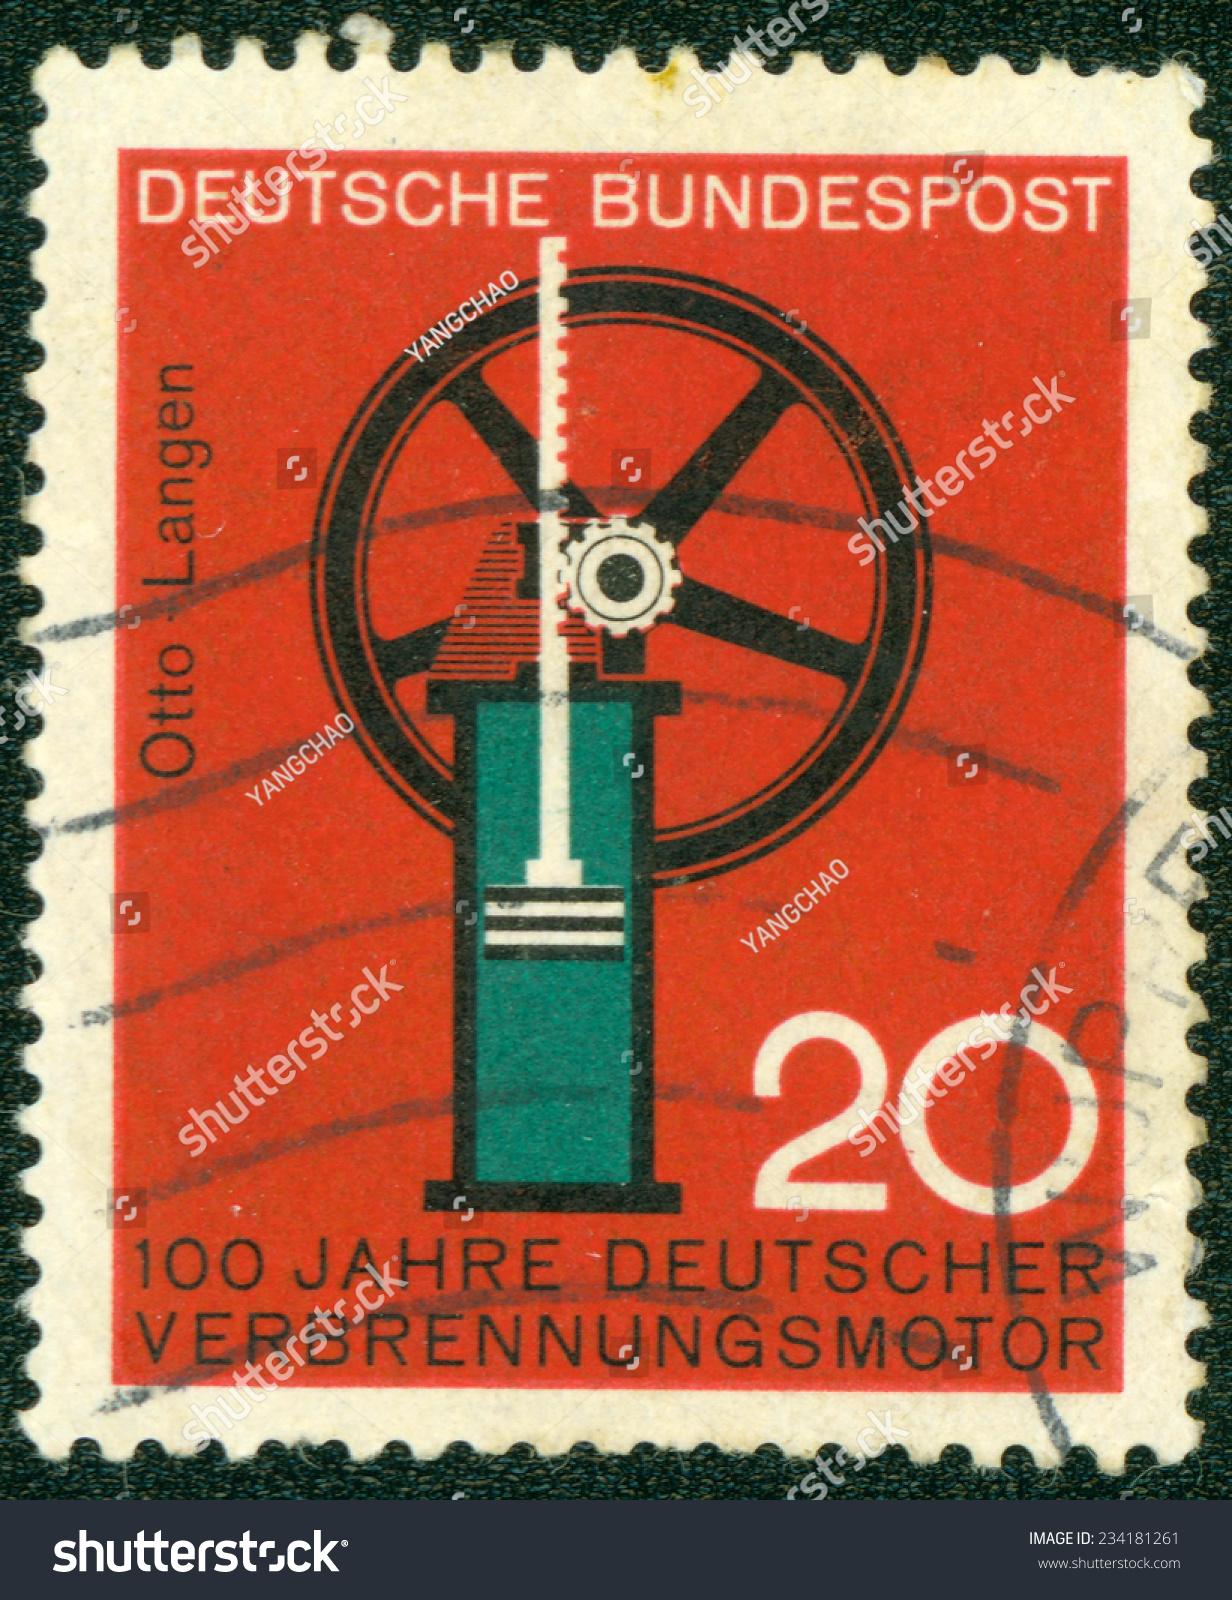 germany circa 1964 postage stamp printed in germany. Black Bedroom Furniture Sets. Home Design Ideas